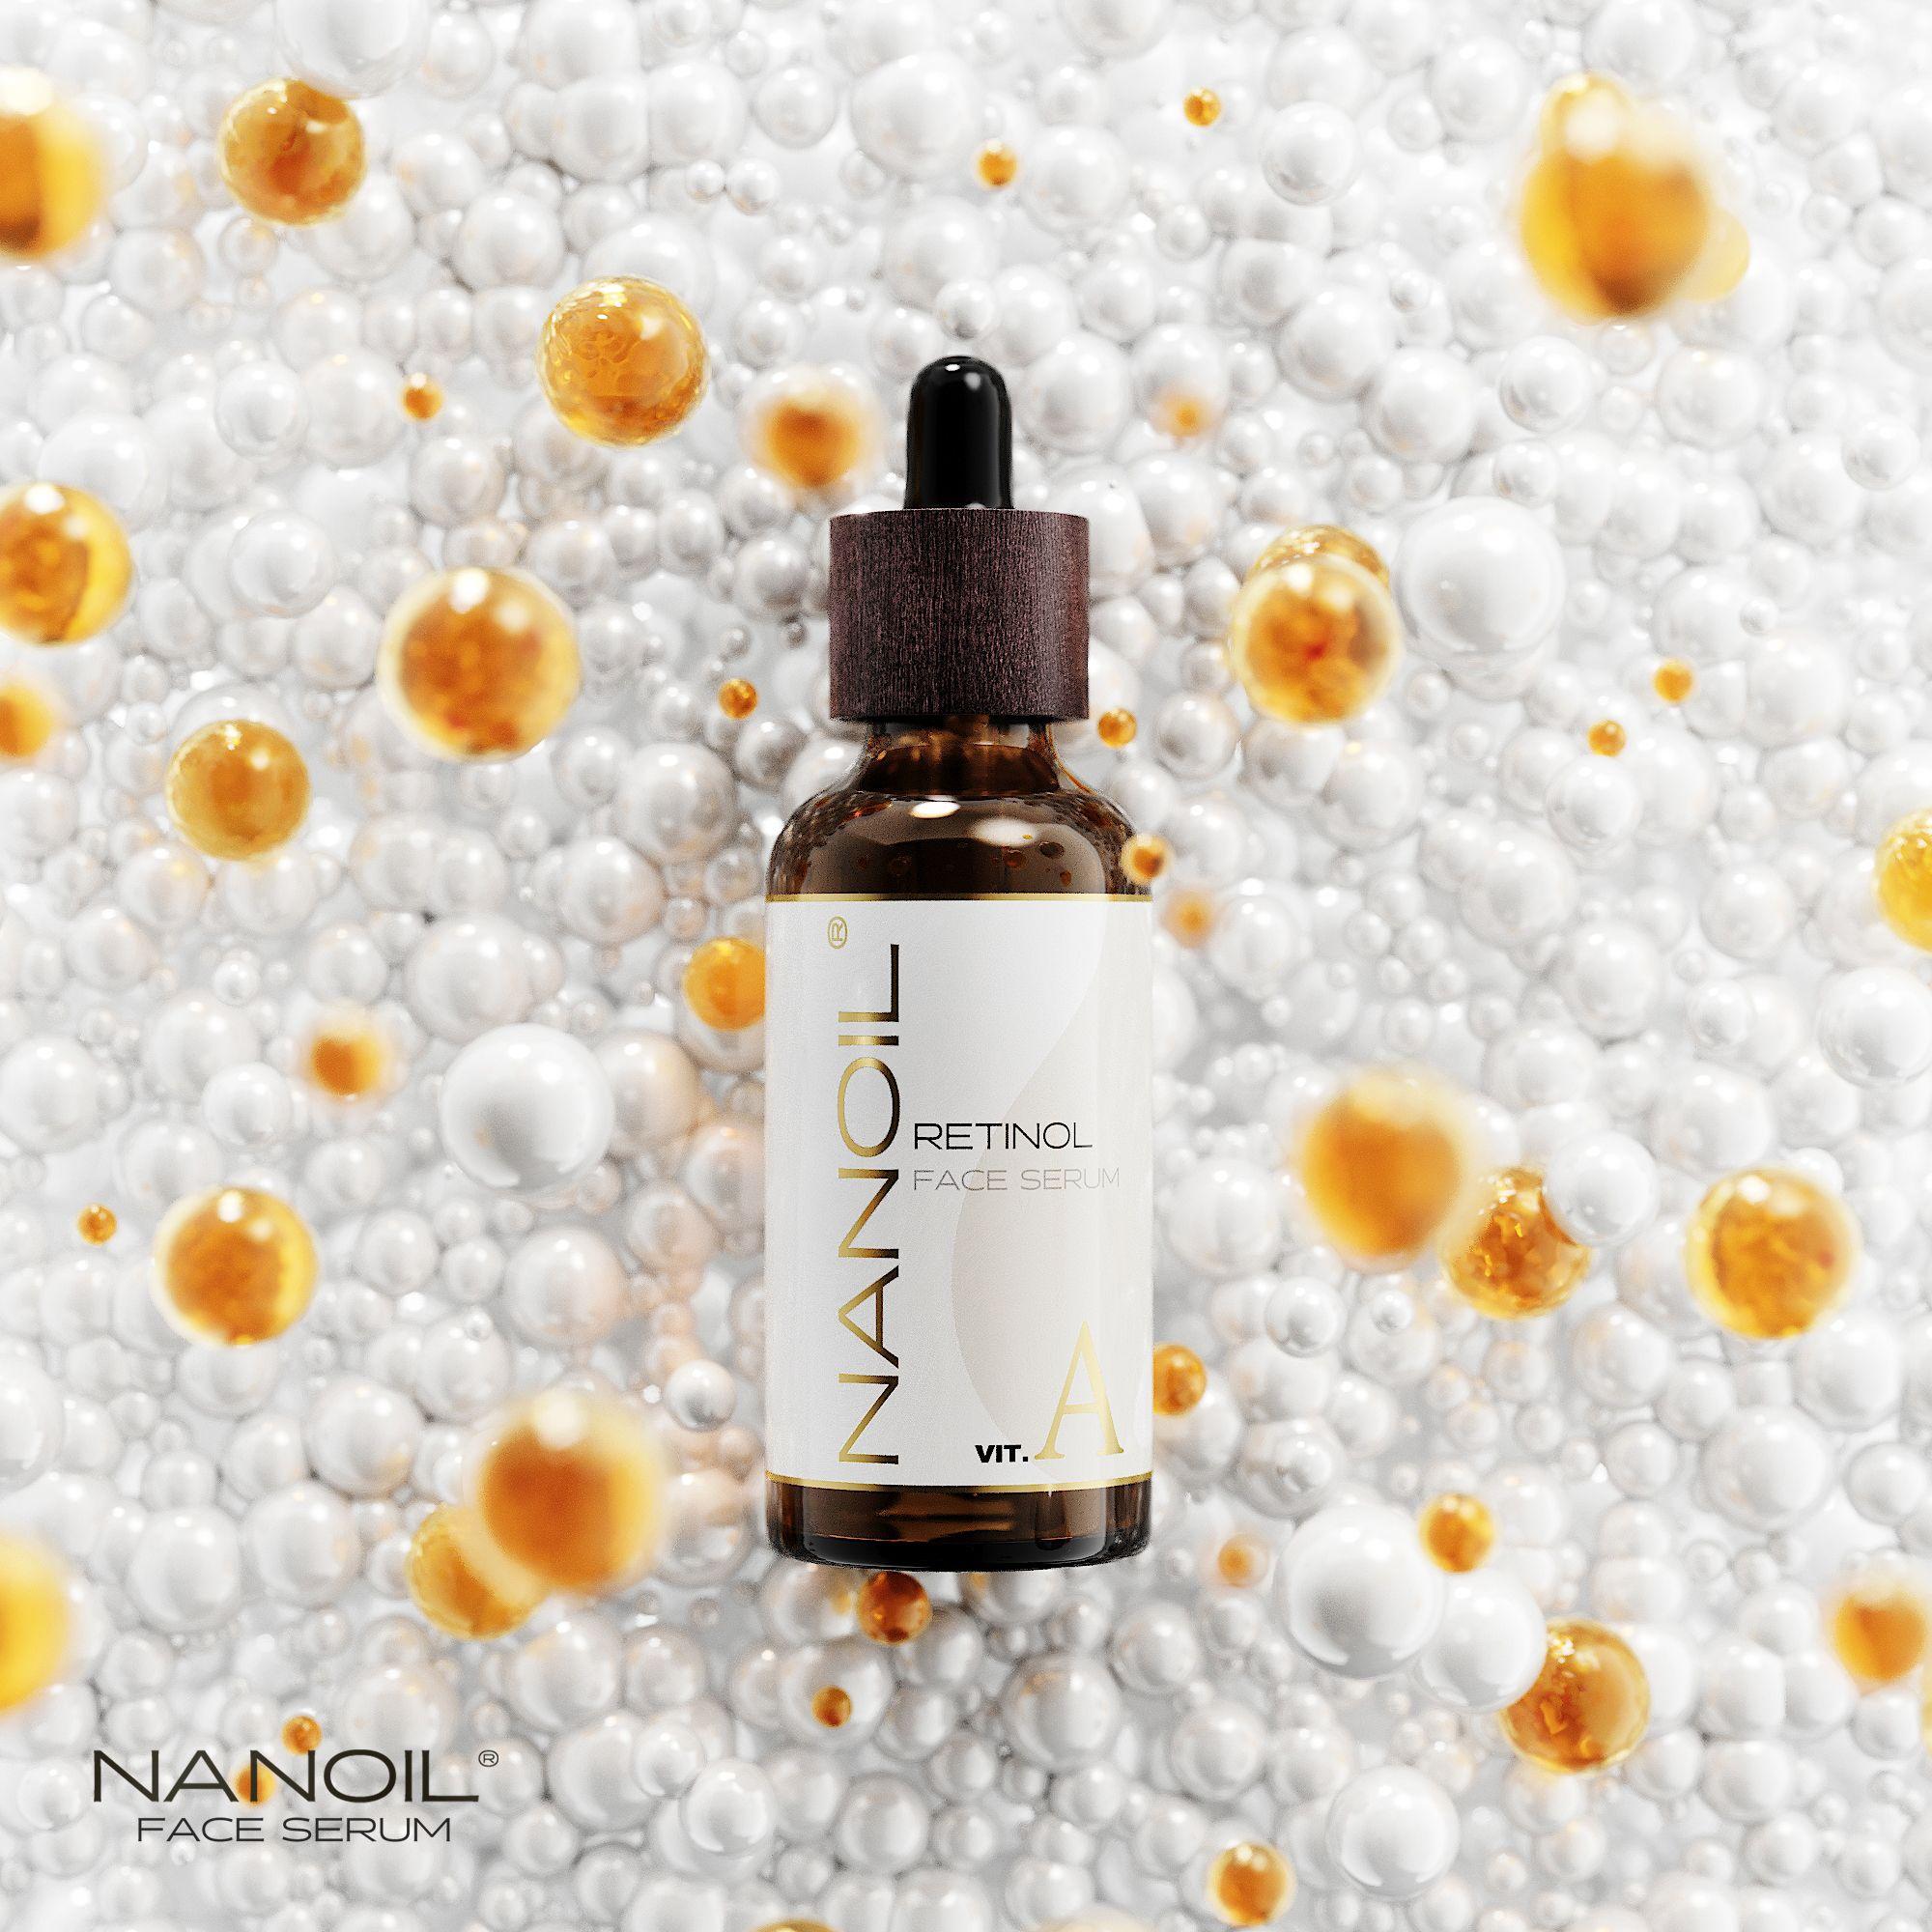 nanoil retinol